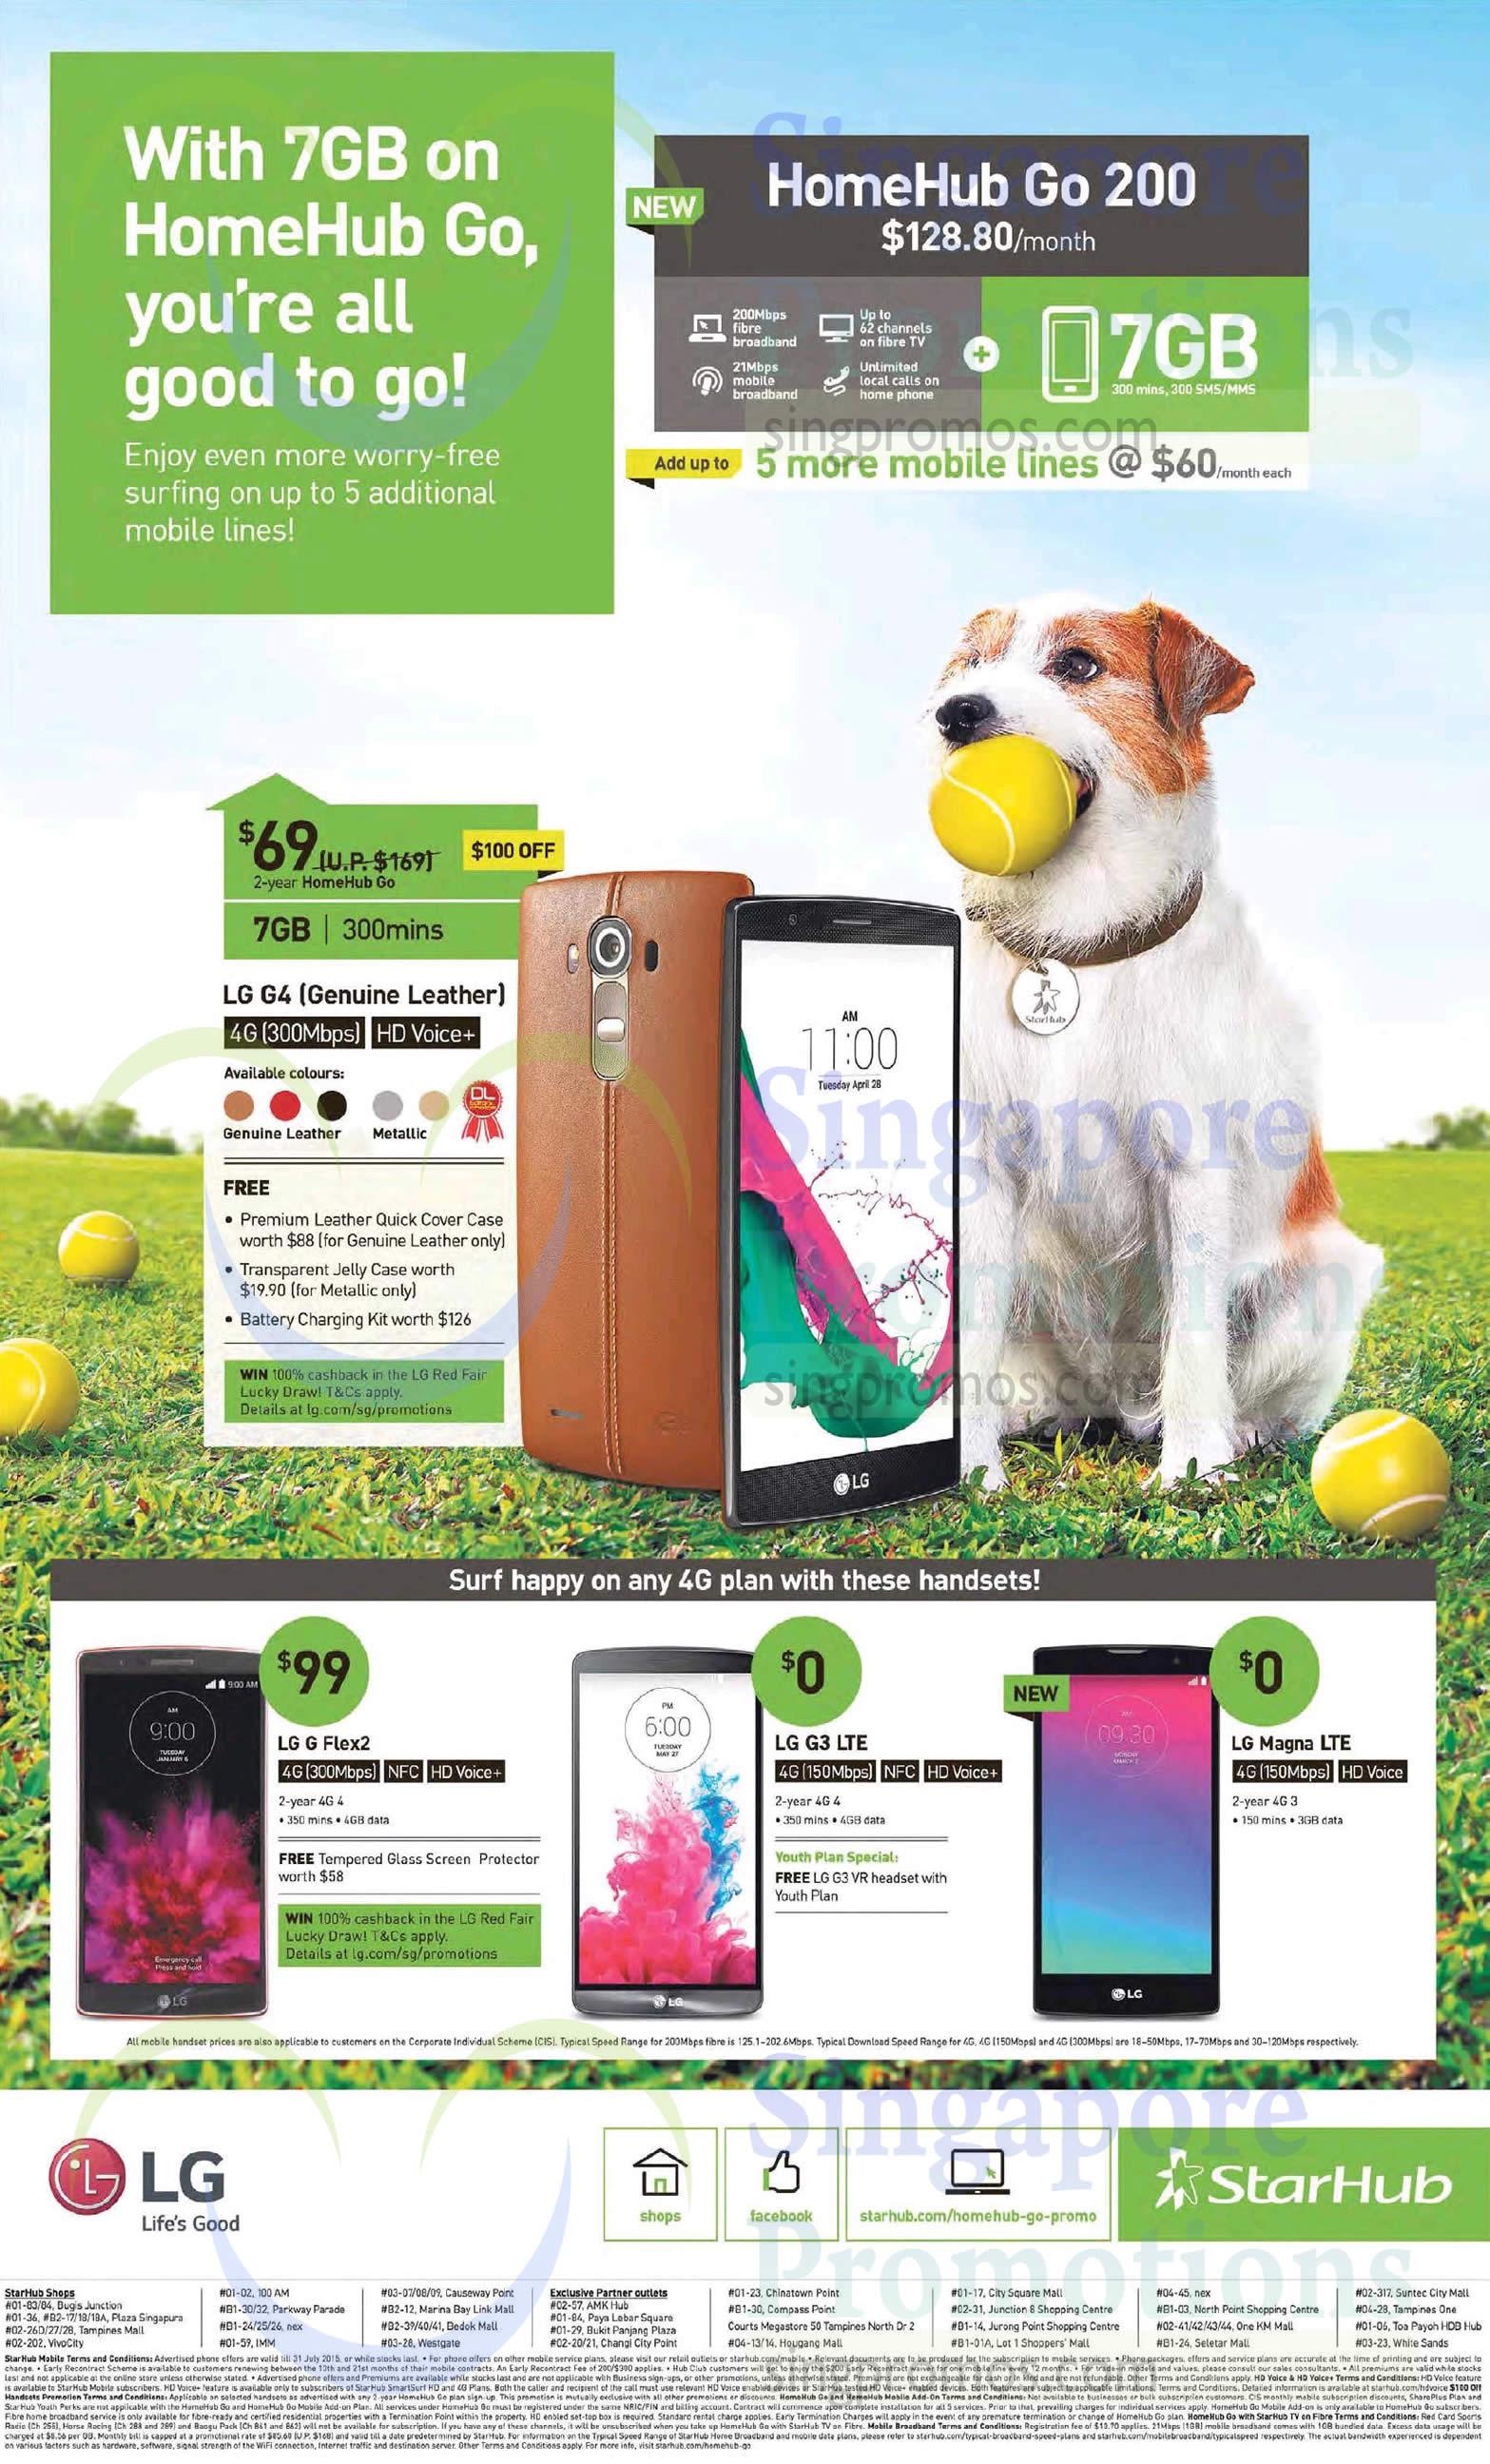 128.80 HomeHub Go 200, LG G4, LG G Flex 2, LG G3, LG Magna